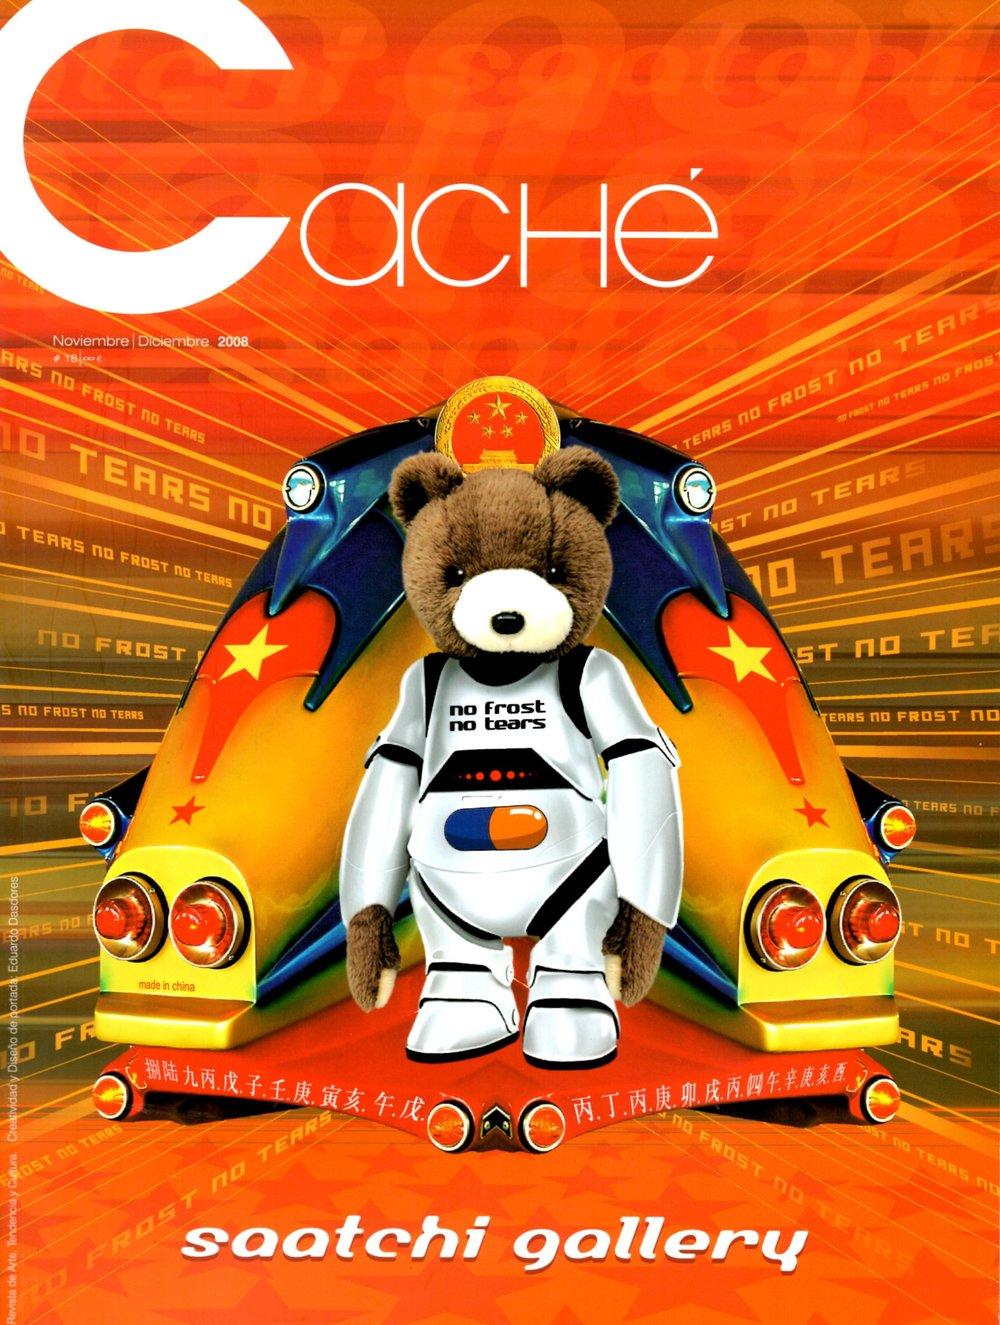 Revista Caché, nº 18